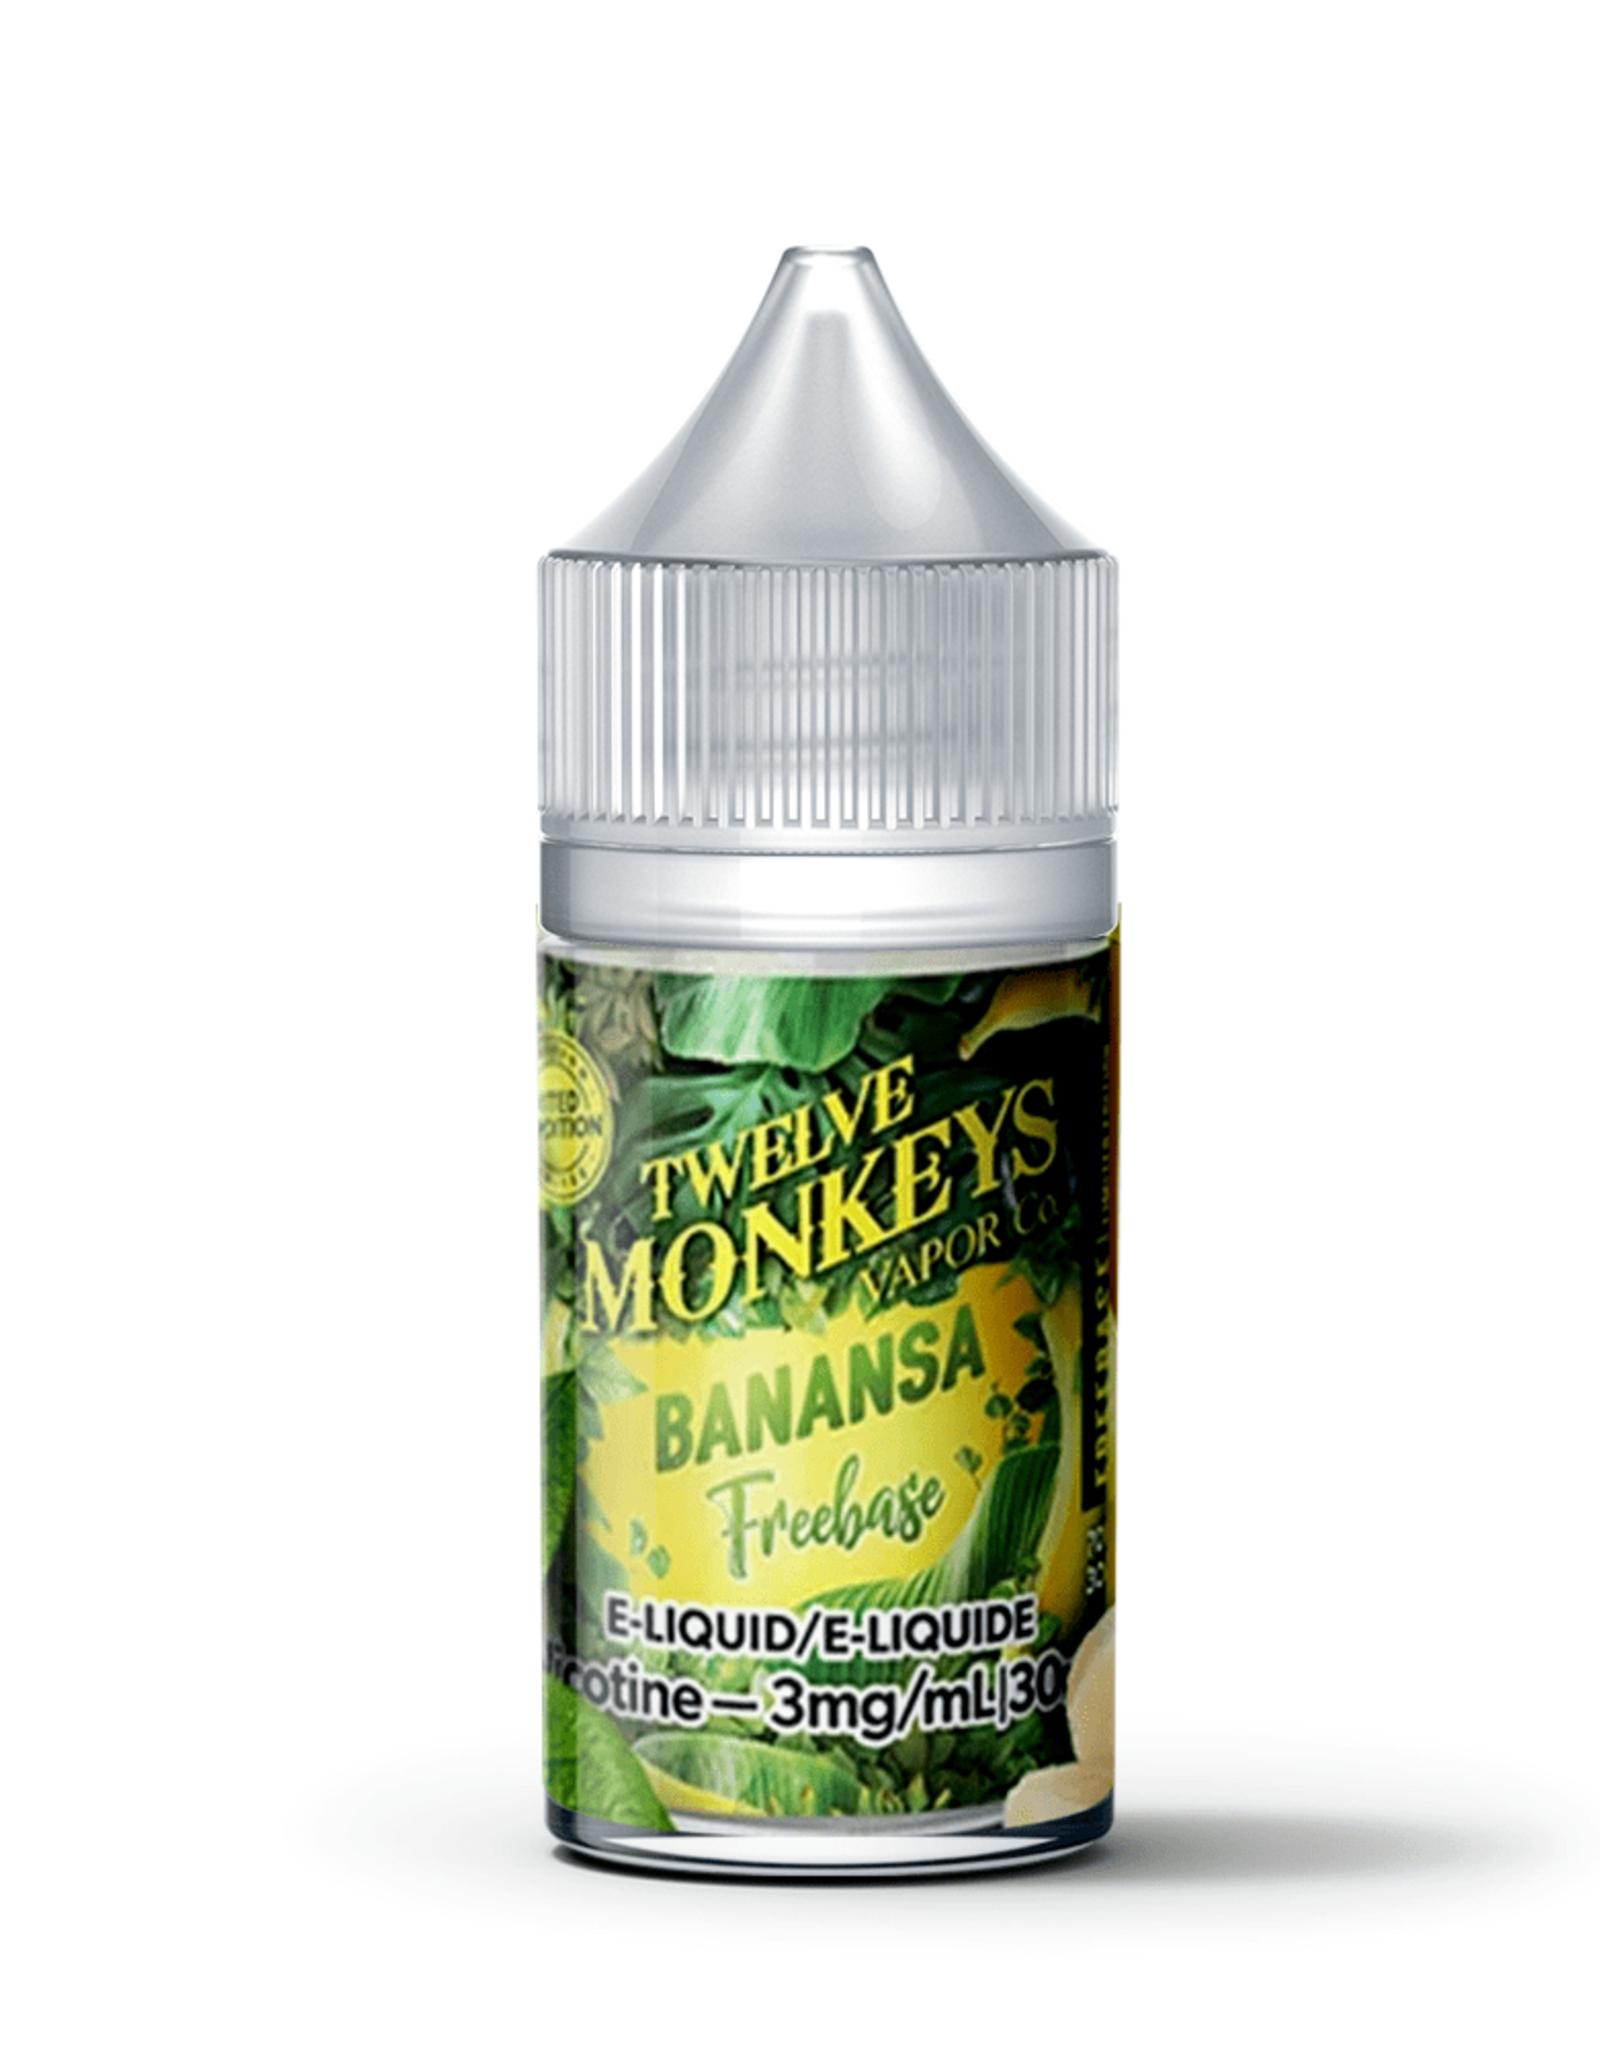 Twelve Monkeys Salt  Banansa 20mg